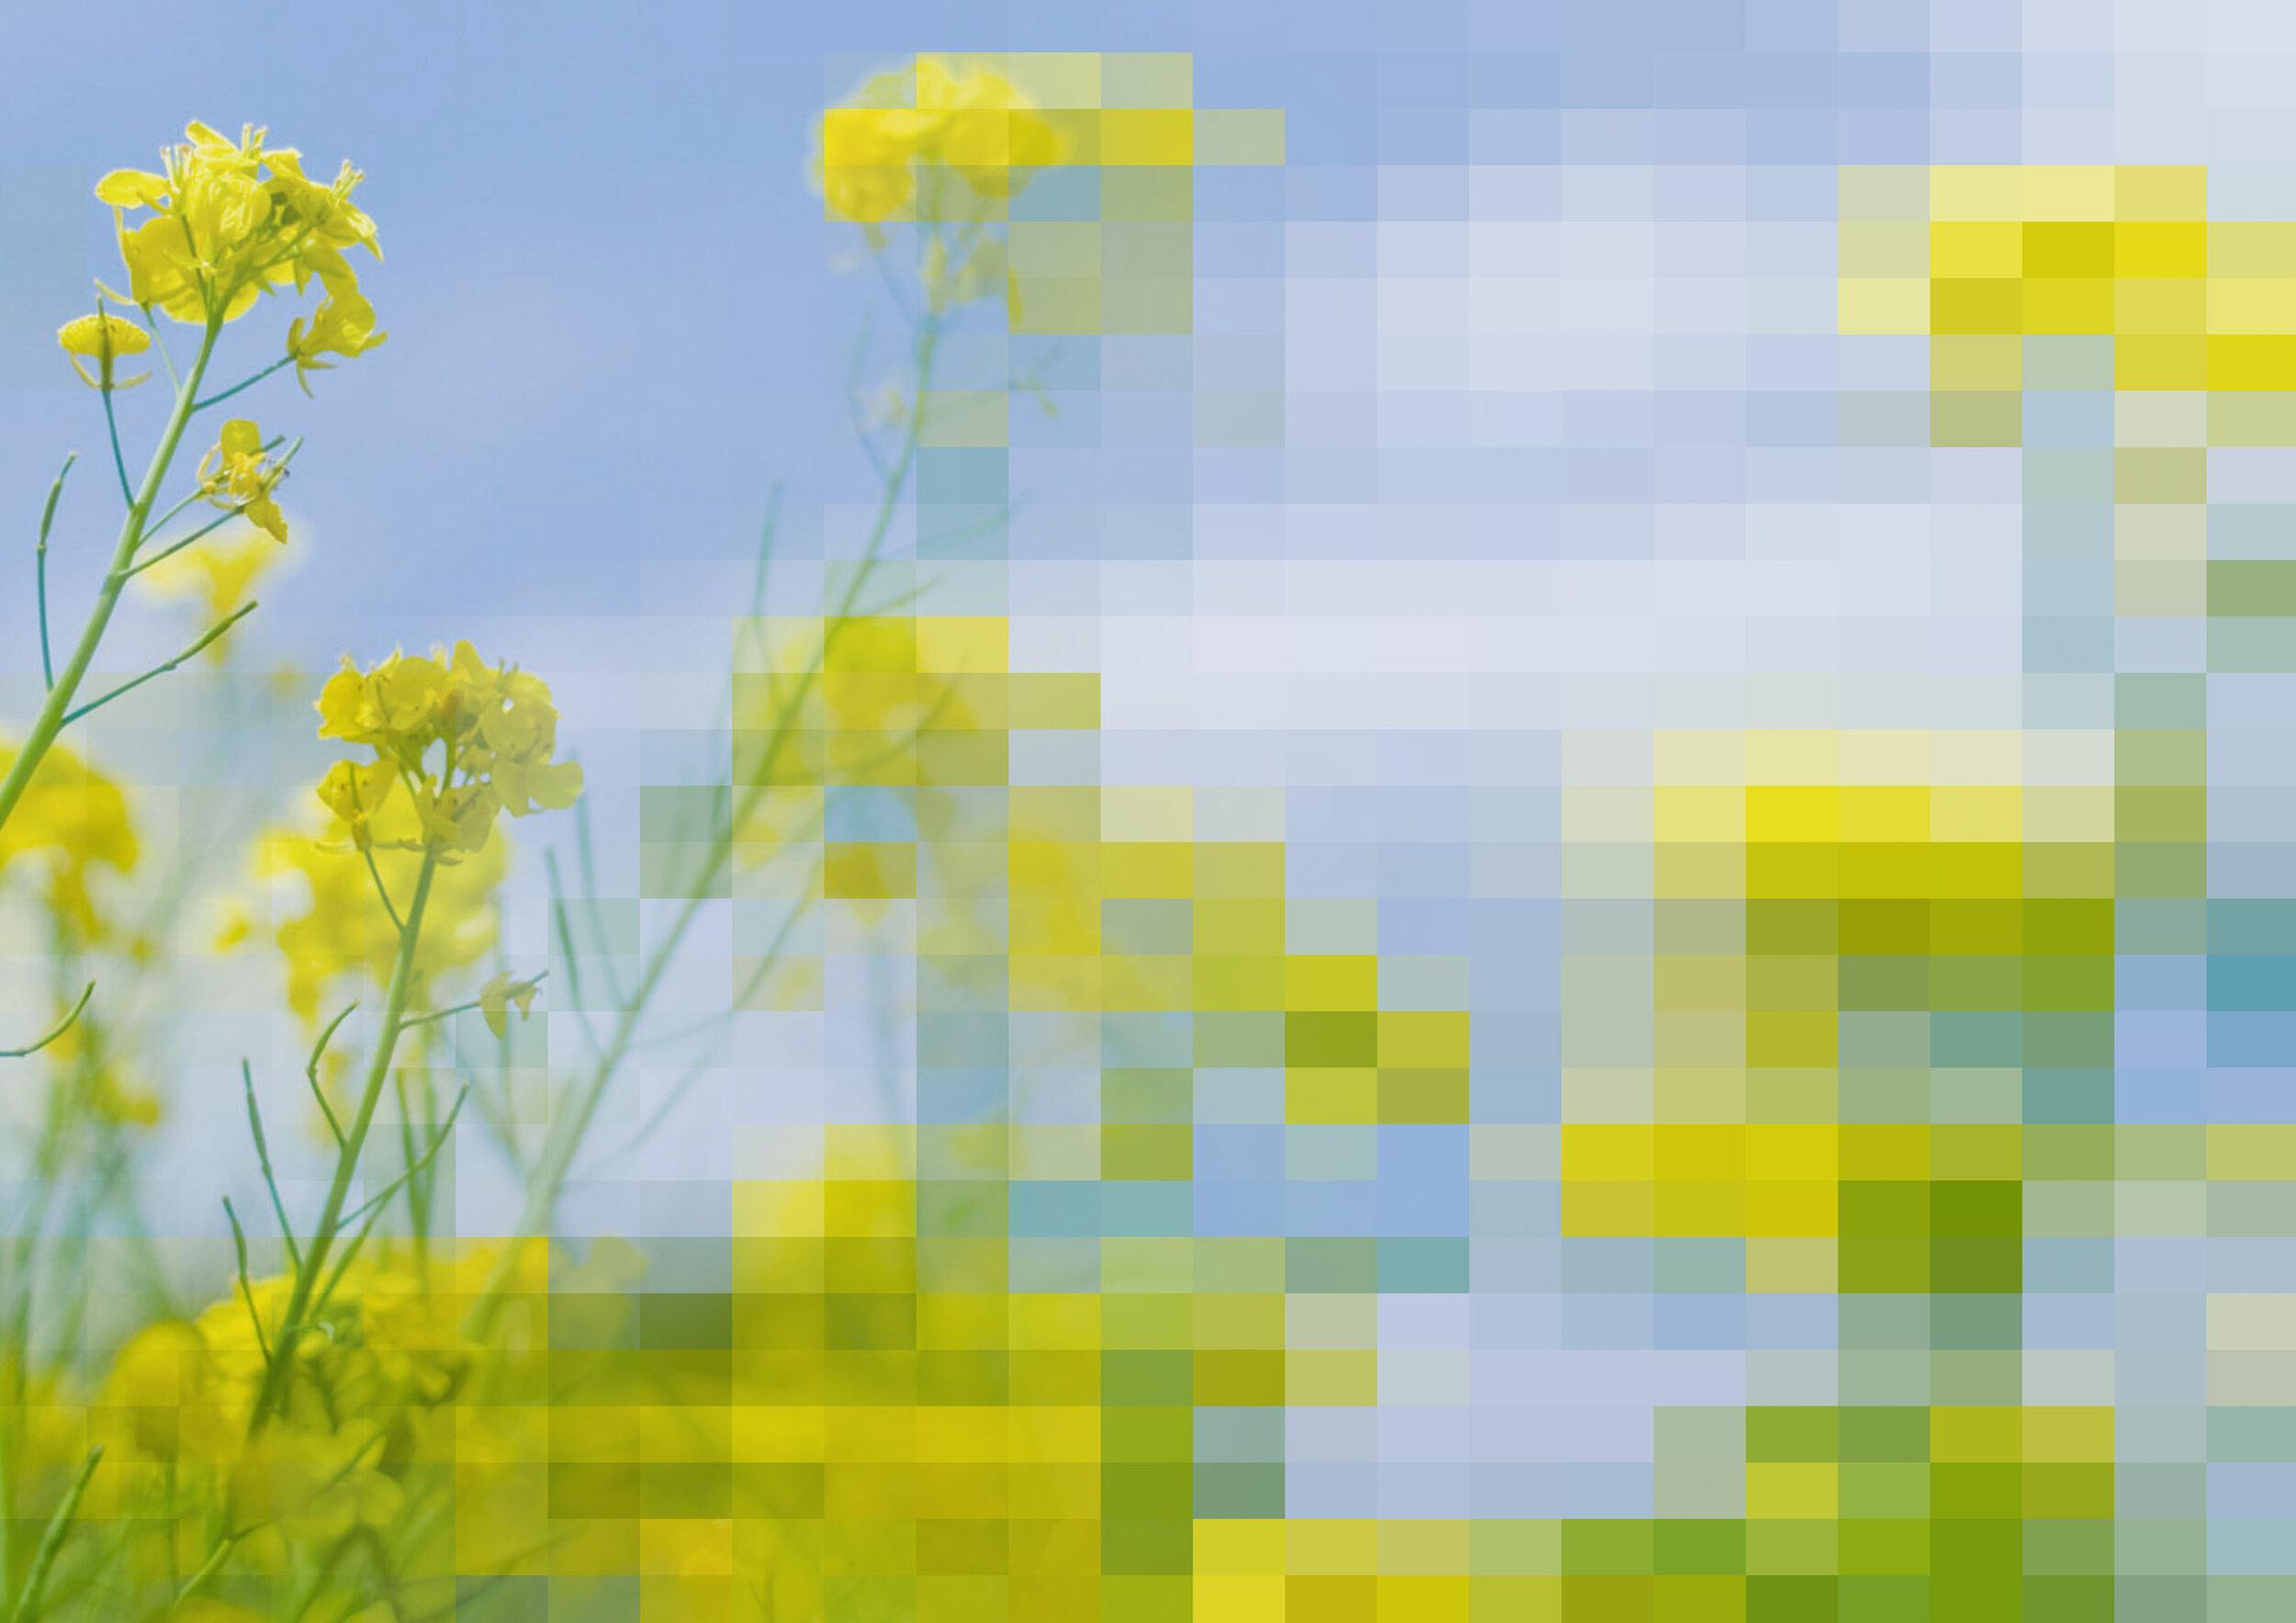 Rape_blossoms_field_abstract-2-2.JPG